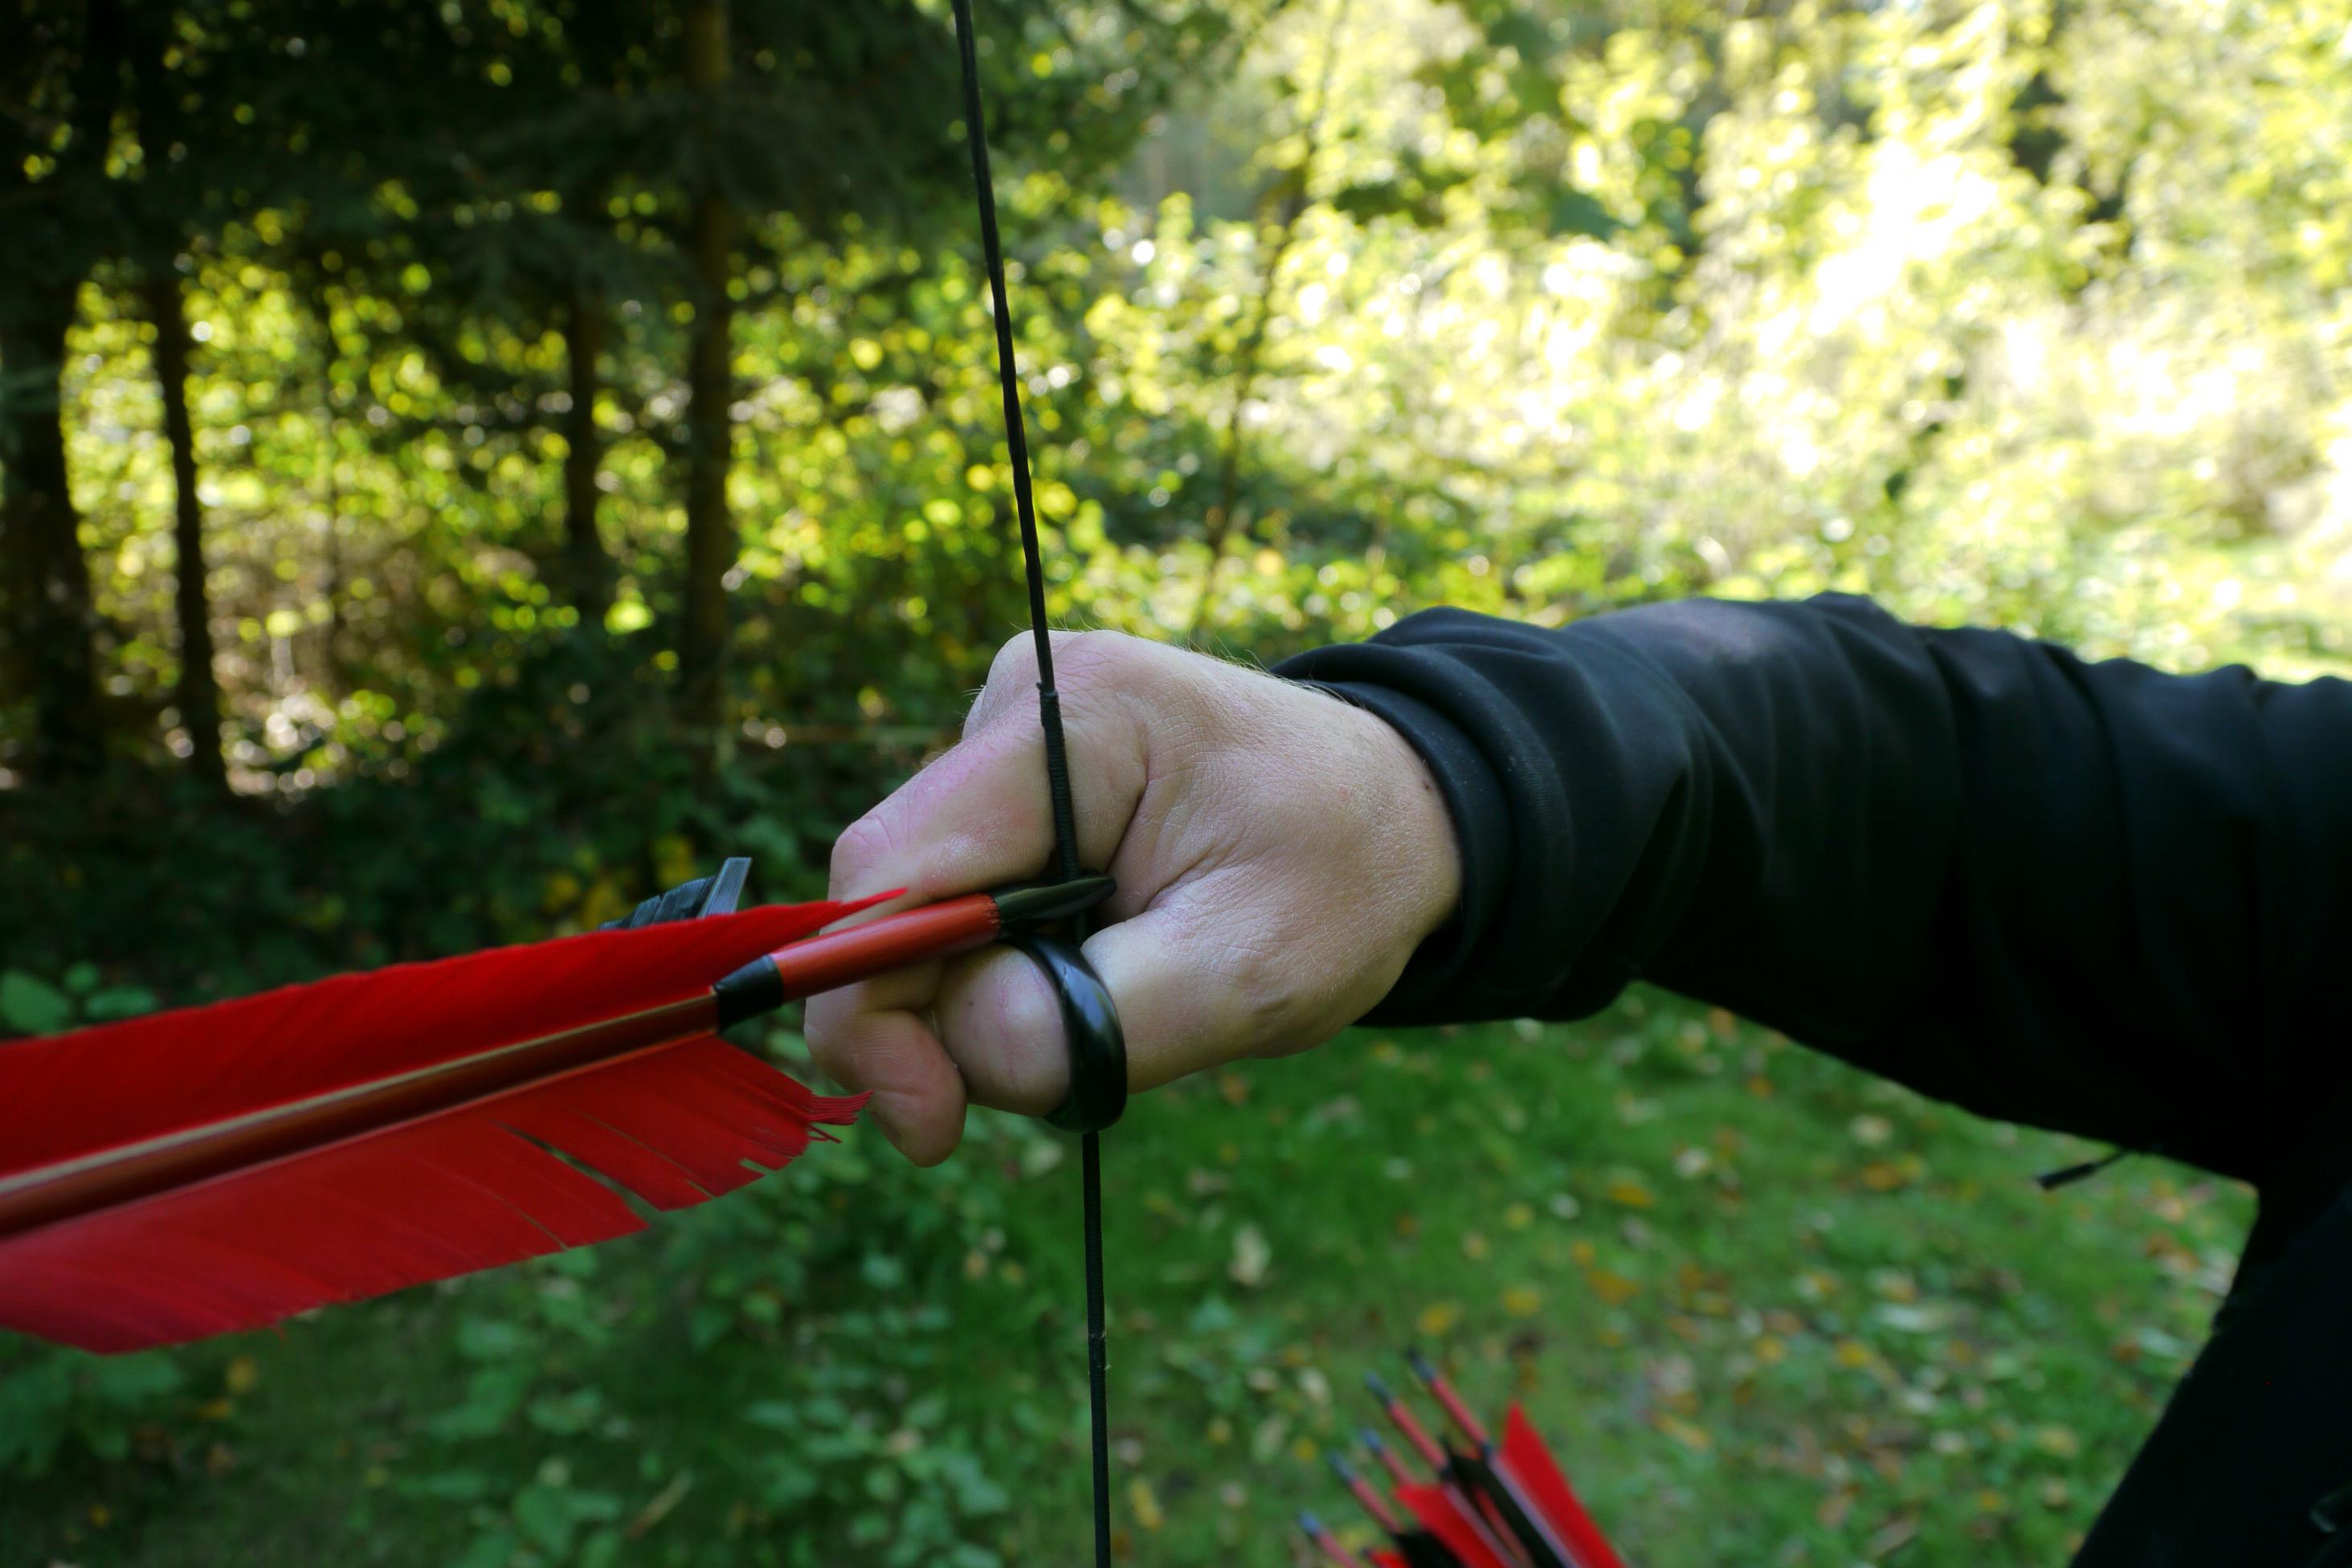 2928x1952 The Drawing Hand Archery Thumb Ring Munich